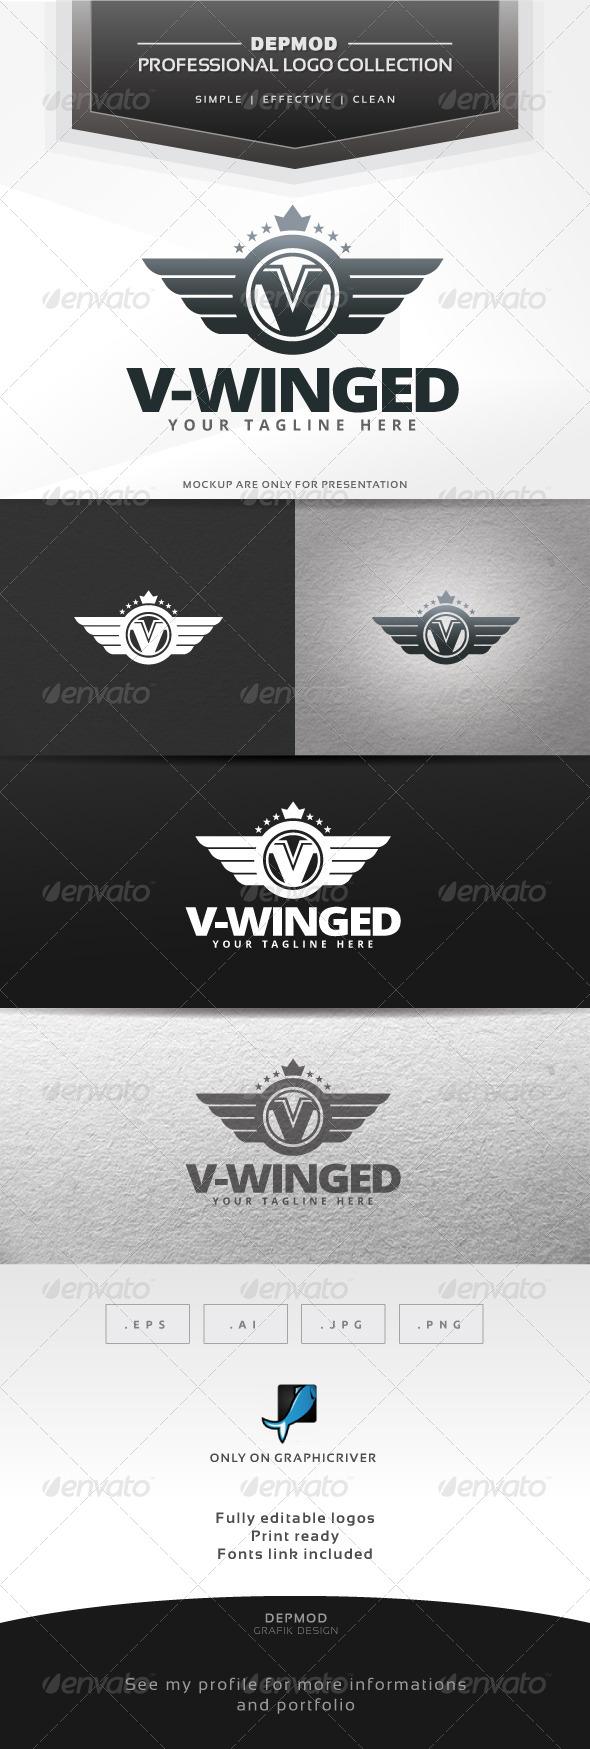 GraphicRiver V-Winged Logo 6563582